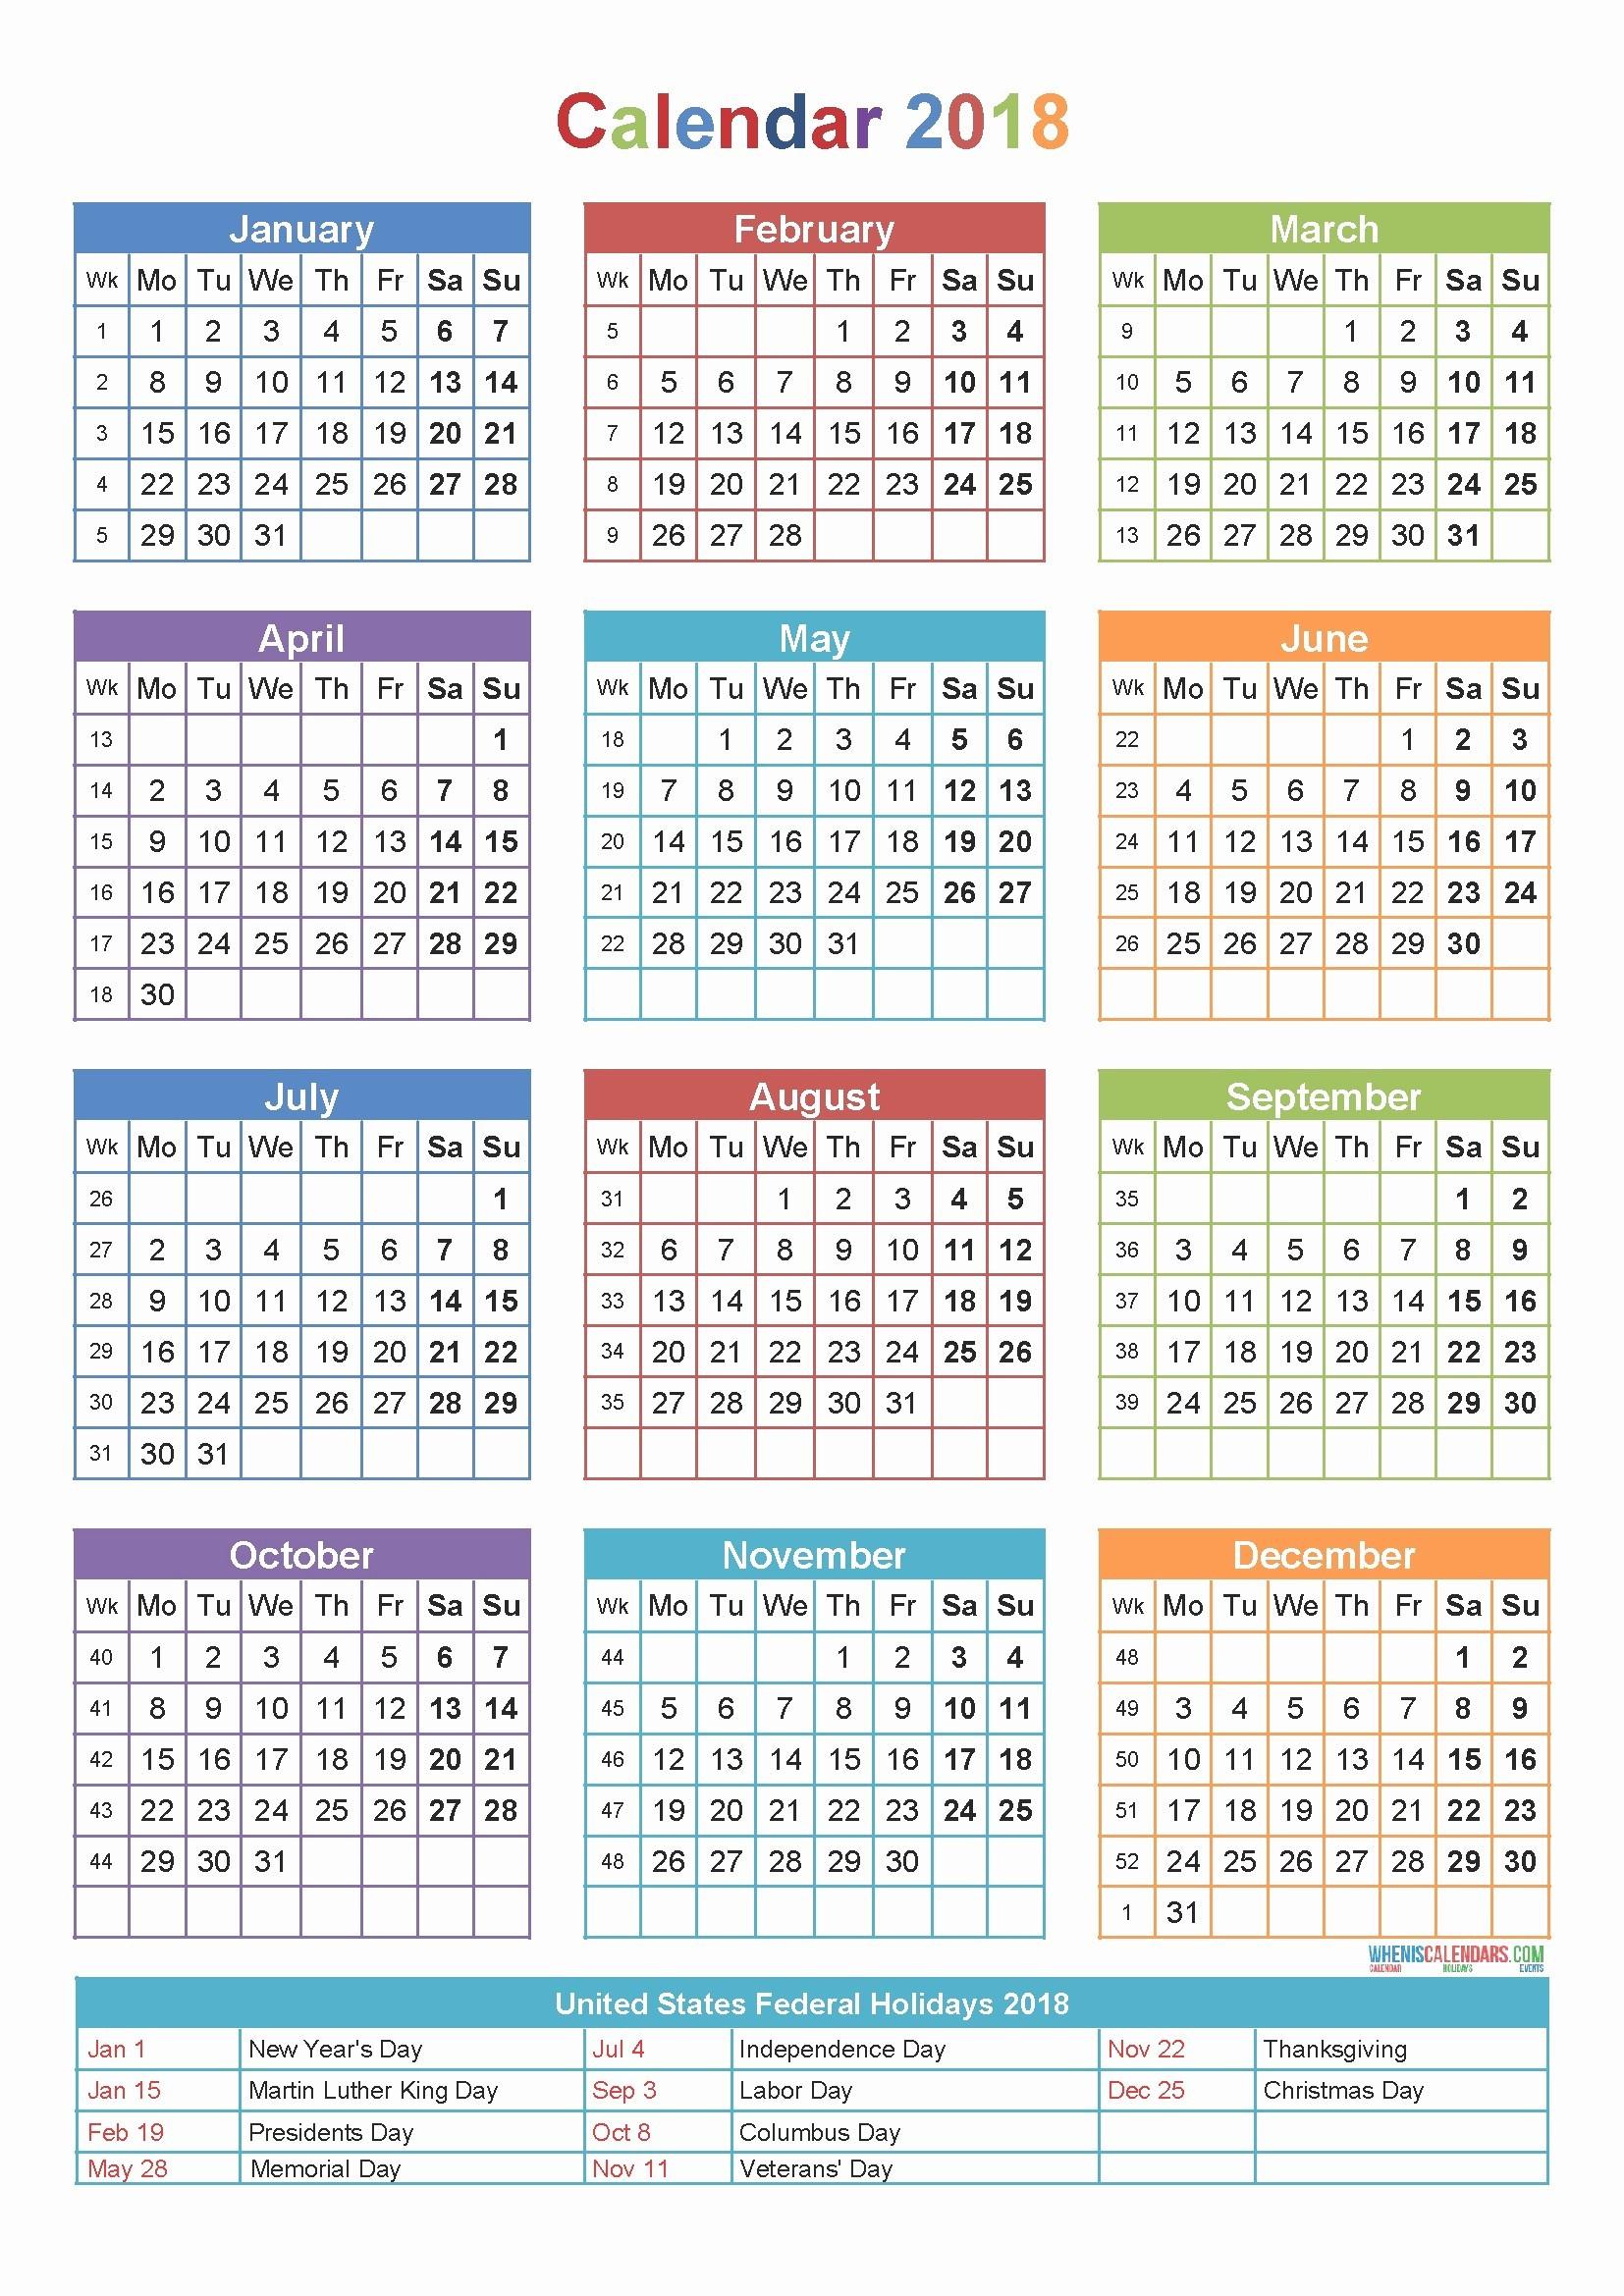 2019 Calendar Template Excel Uk Yearly Calendars 2018 Free Printable Calendar 2016 2018 Blank 2019